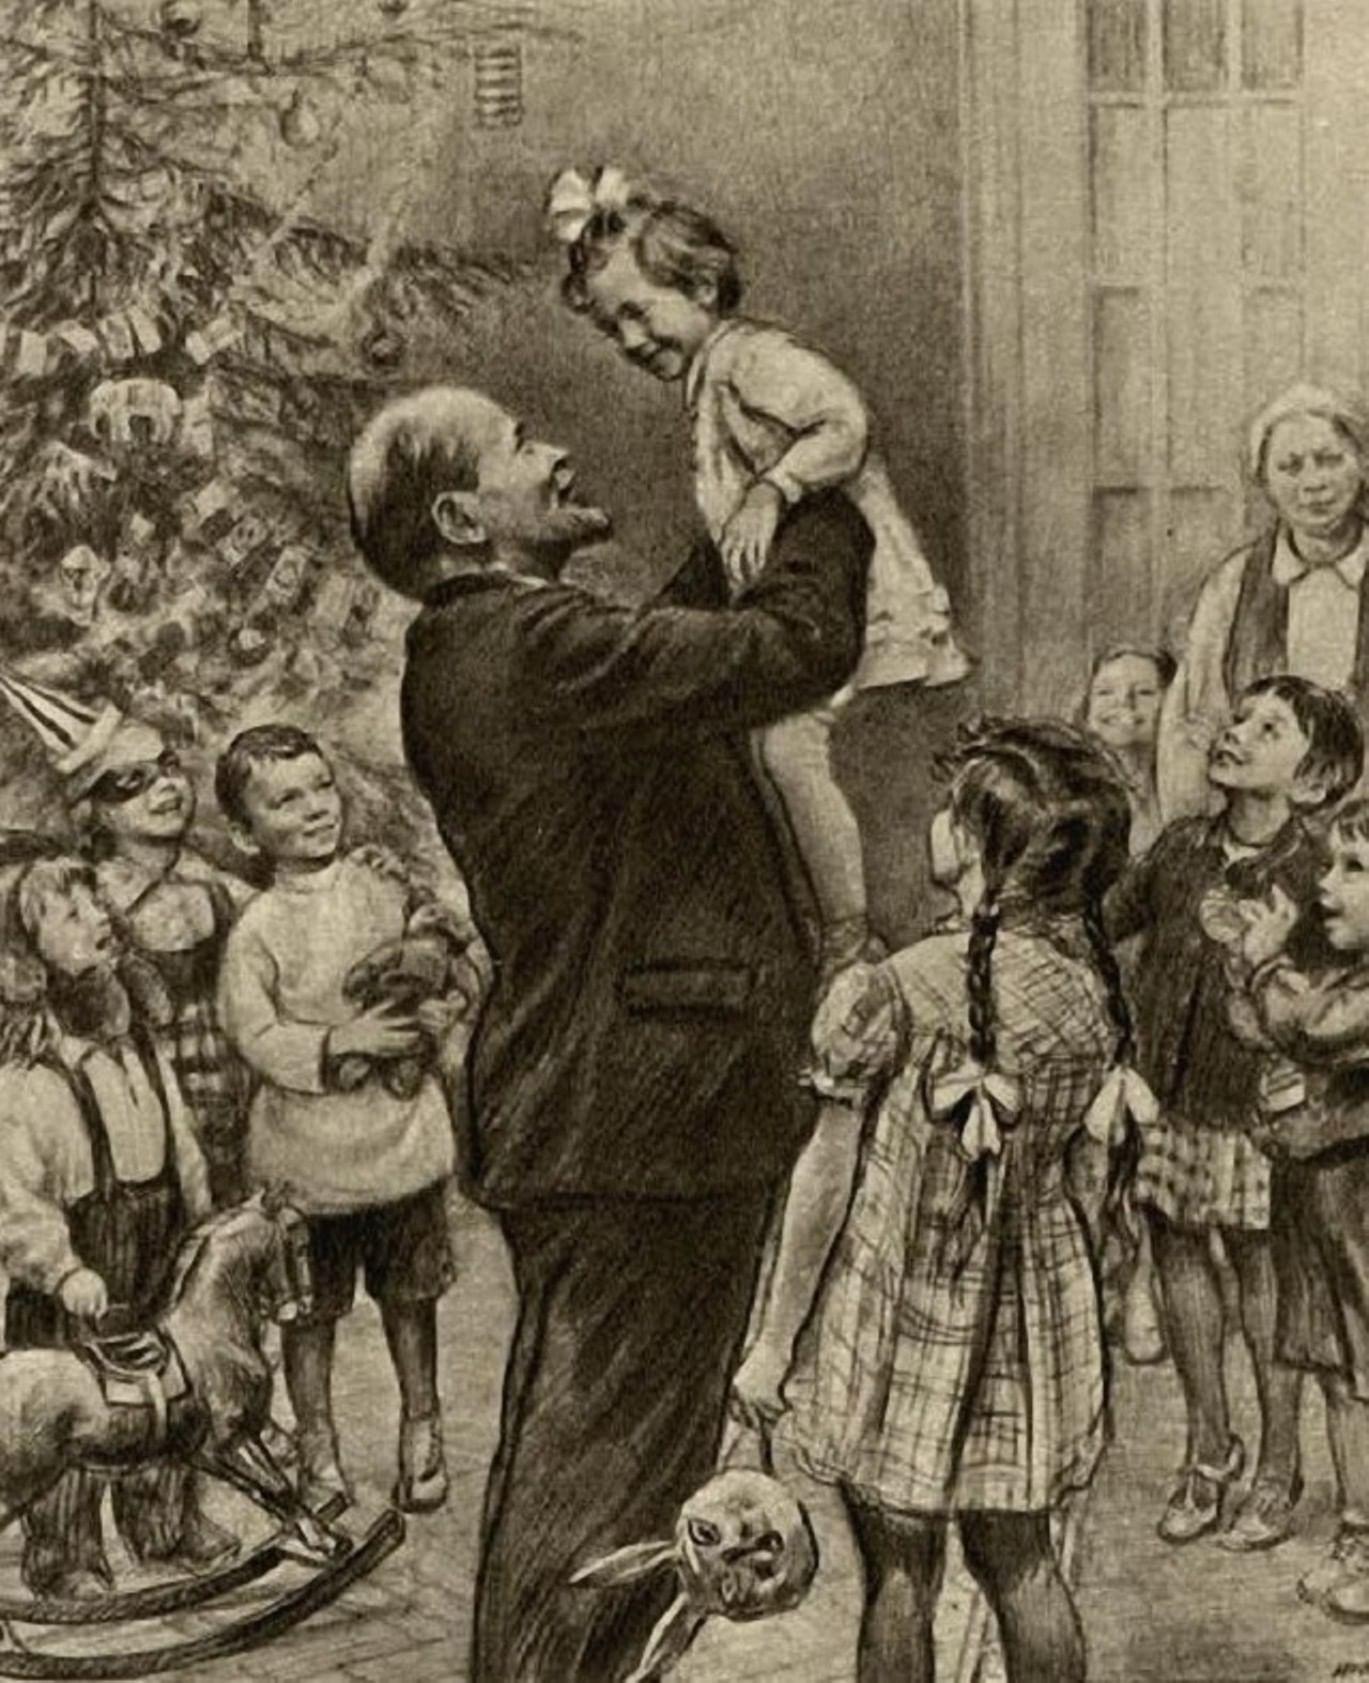 Рождество в Стране Советов. Галерея 1